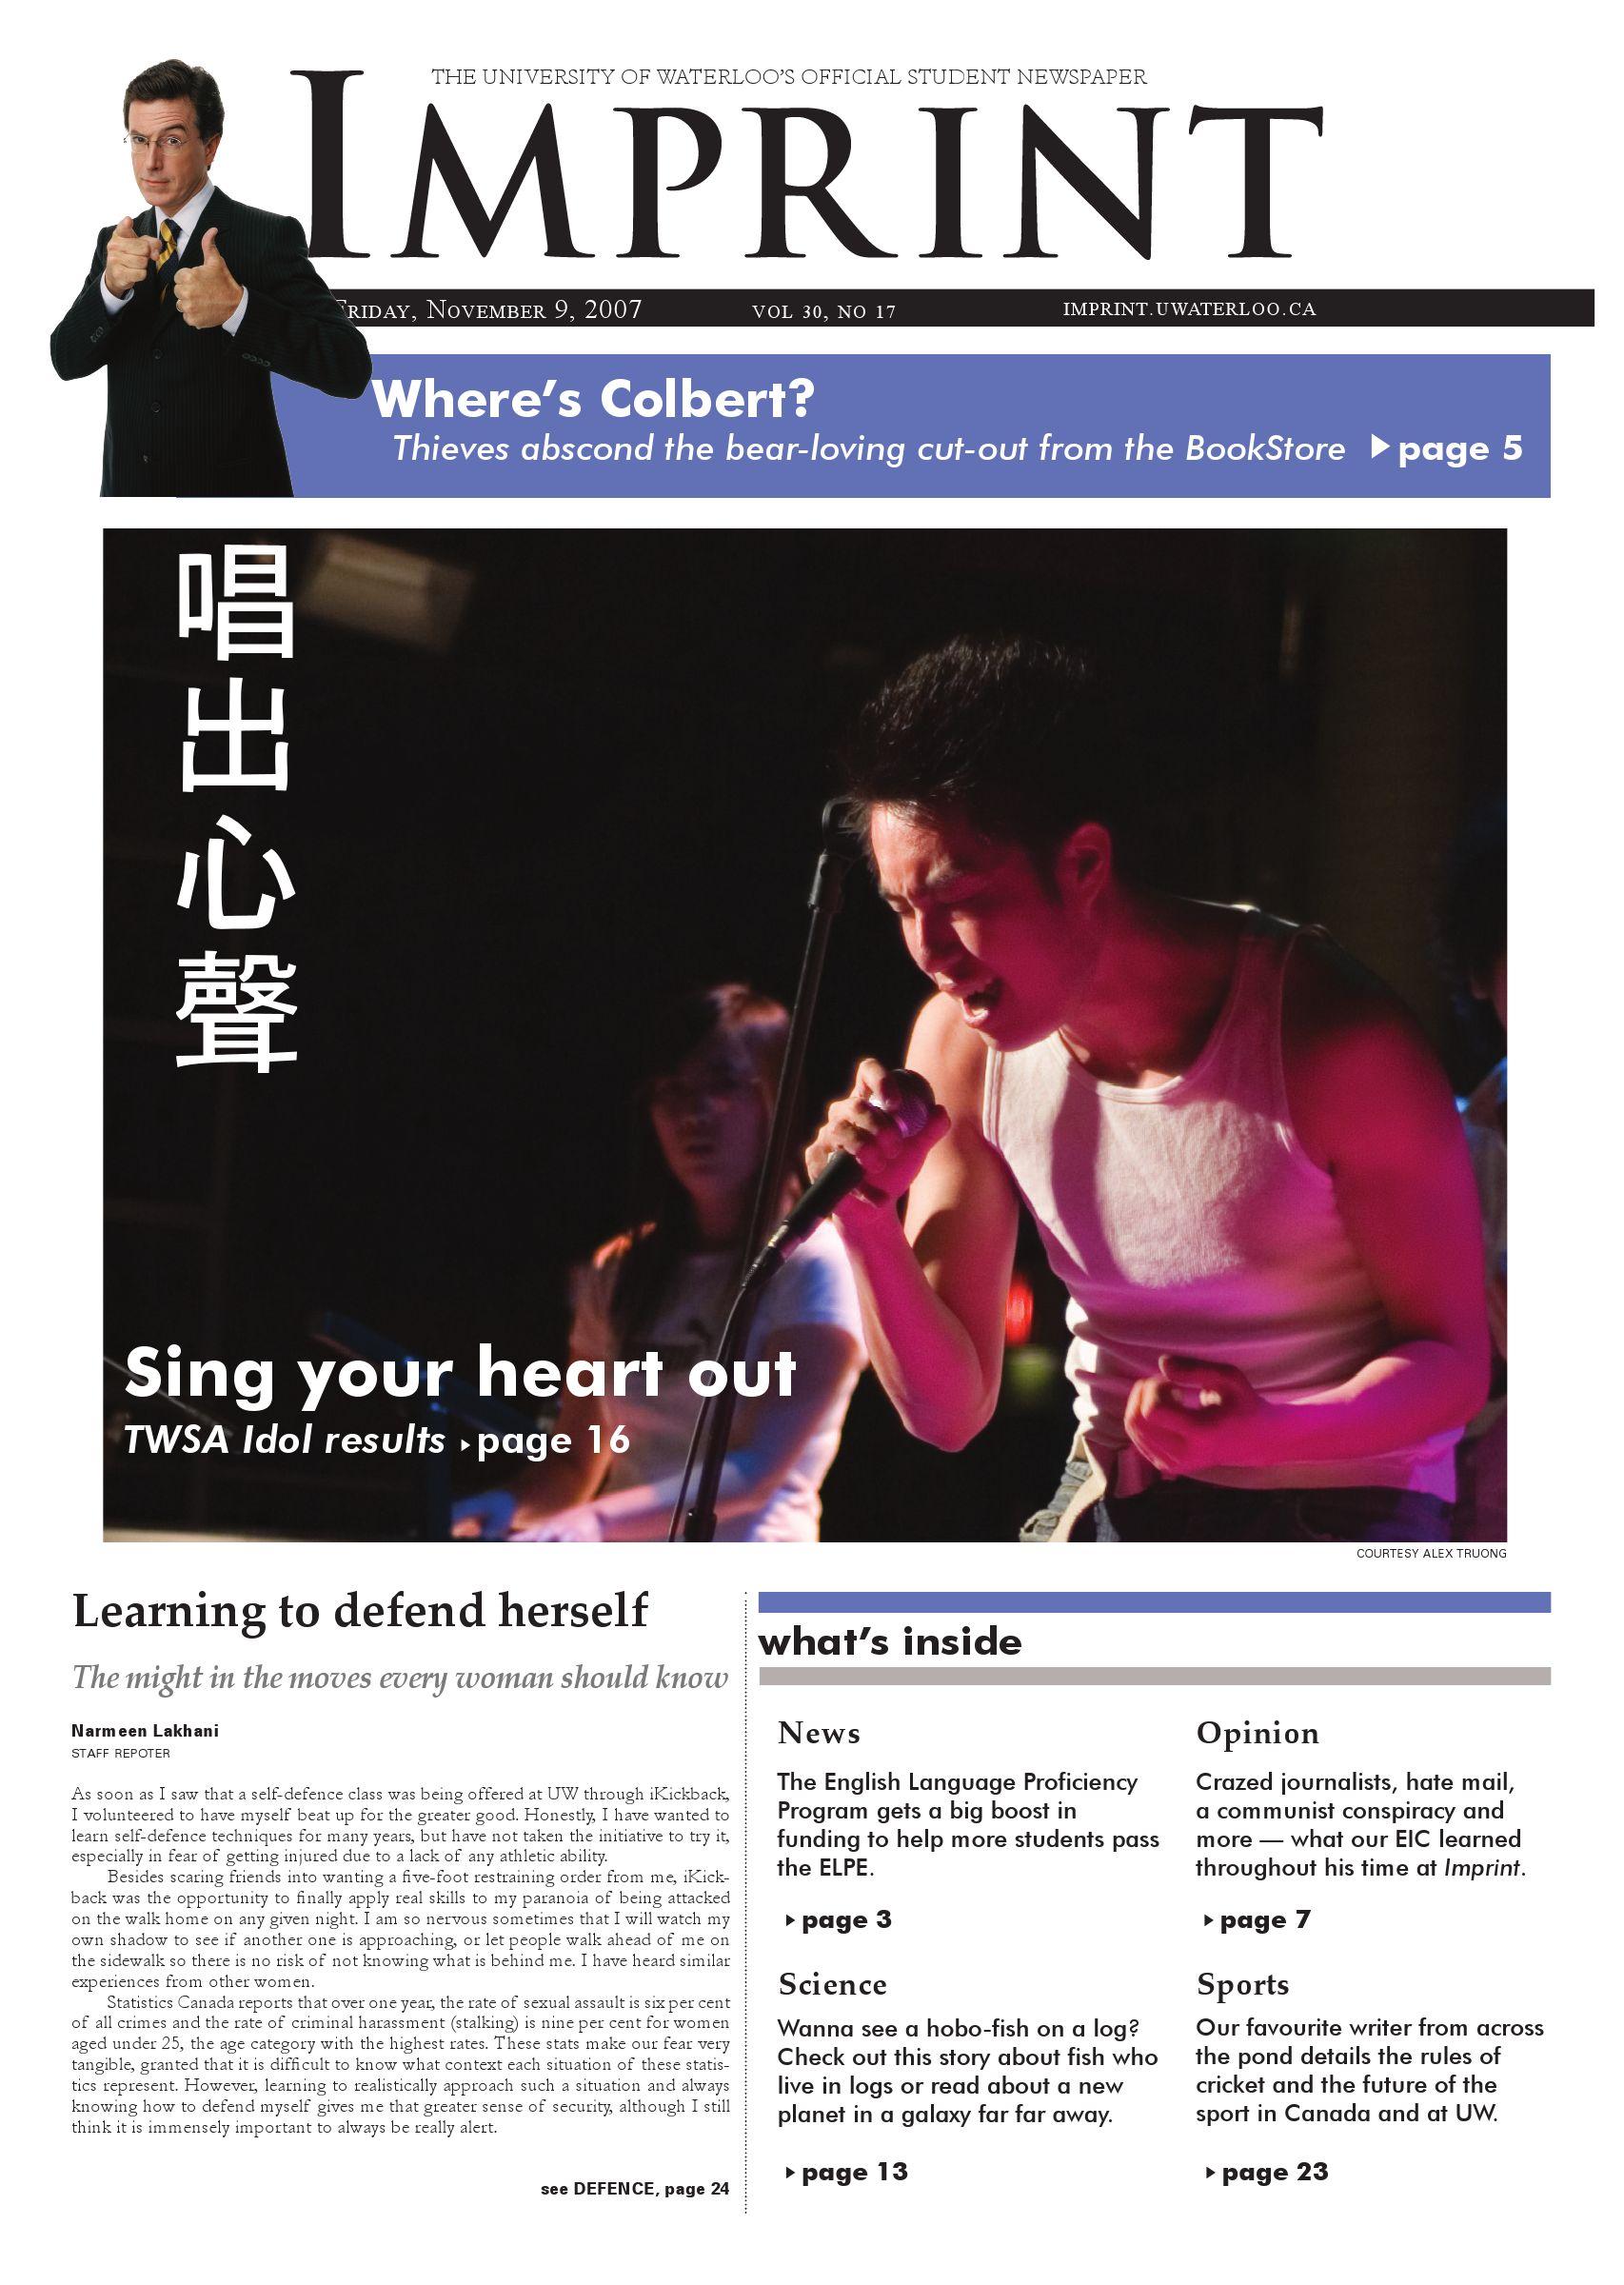 http://imprint uwaterloo ca/mambo/pdfarchive/Imprint_2007-11